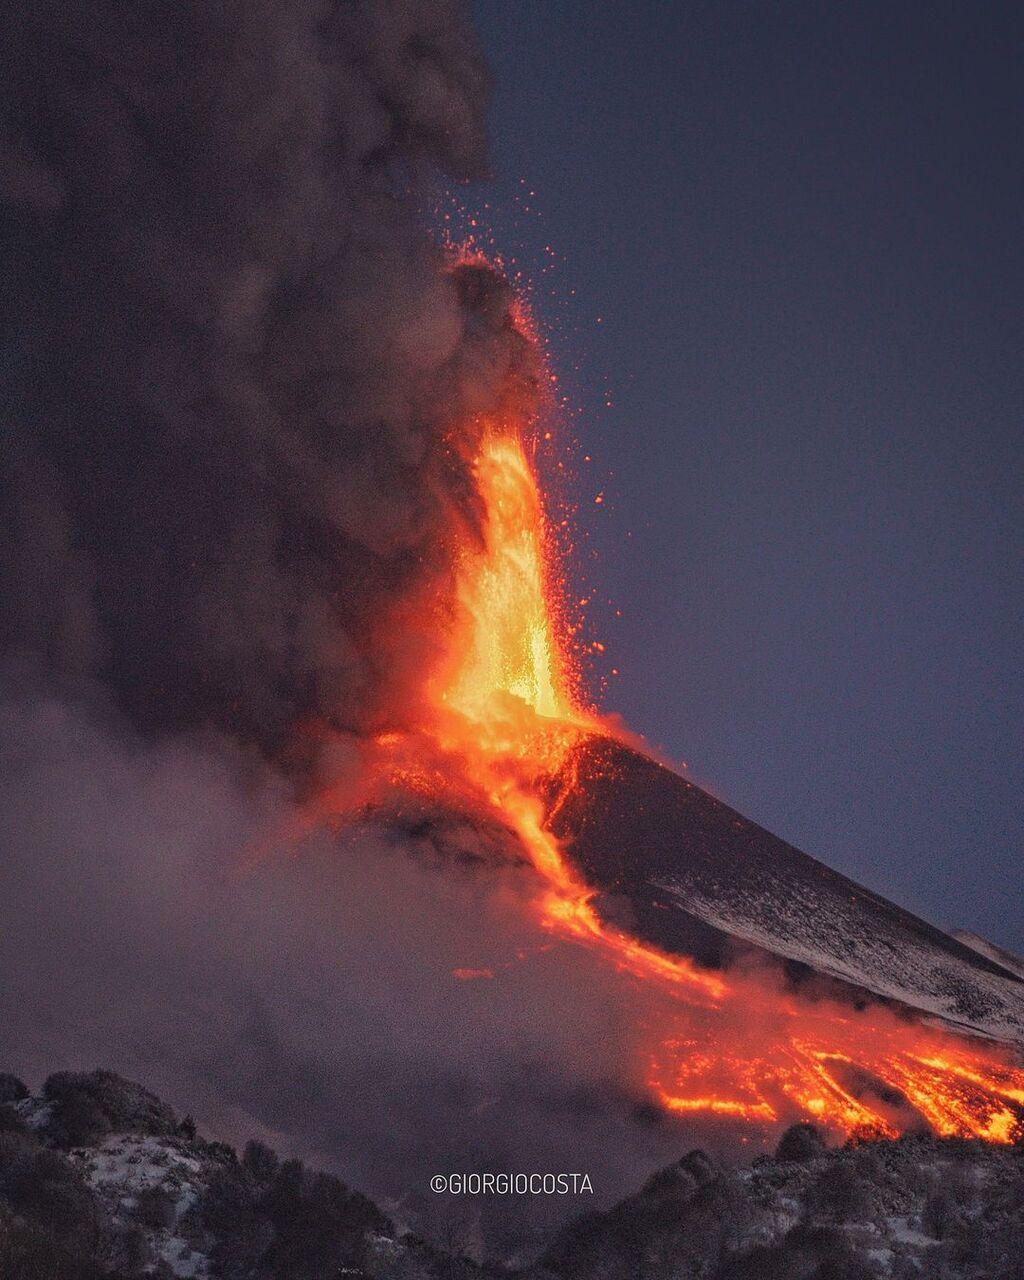 Lava fountain during the peak of the lastest paroxysm at Etna's New SE crater (image: Giorgio Costa / facebook)